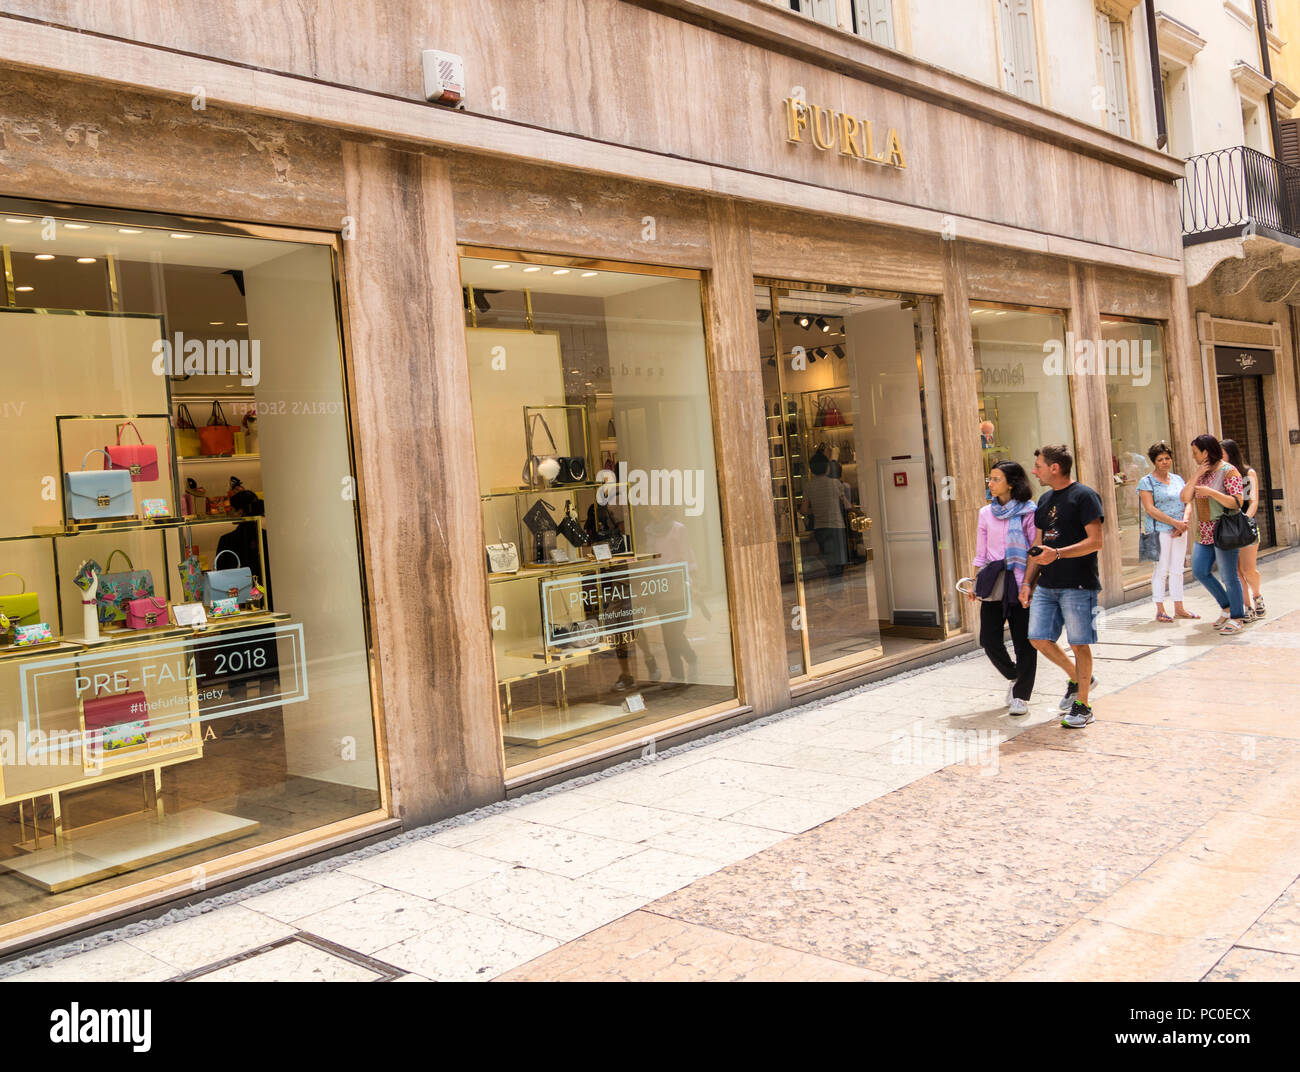 eb939ef5a26df Sacs à main de luxe boutique marque Furla store Vérone Italie Banque ...